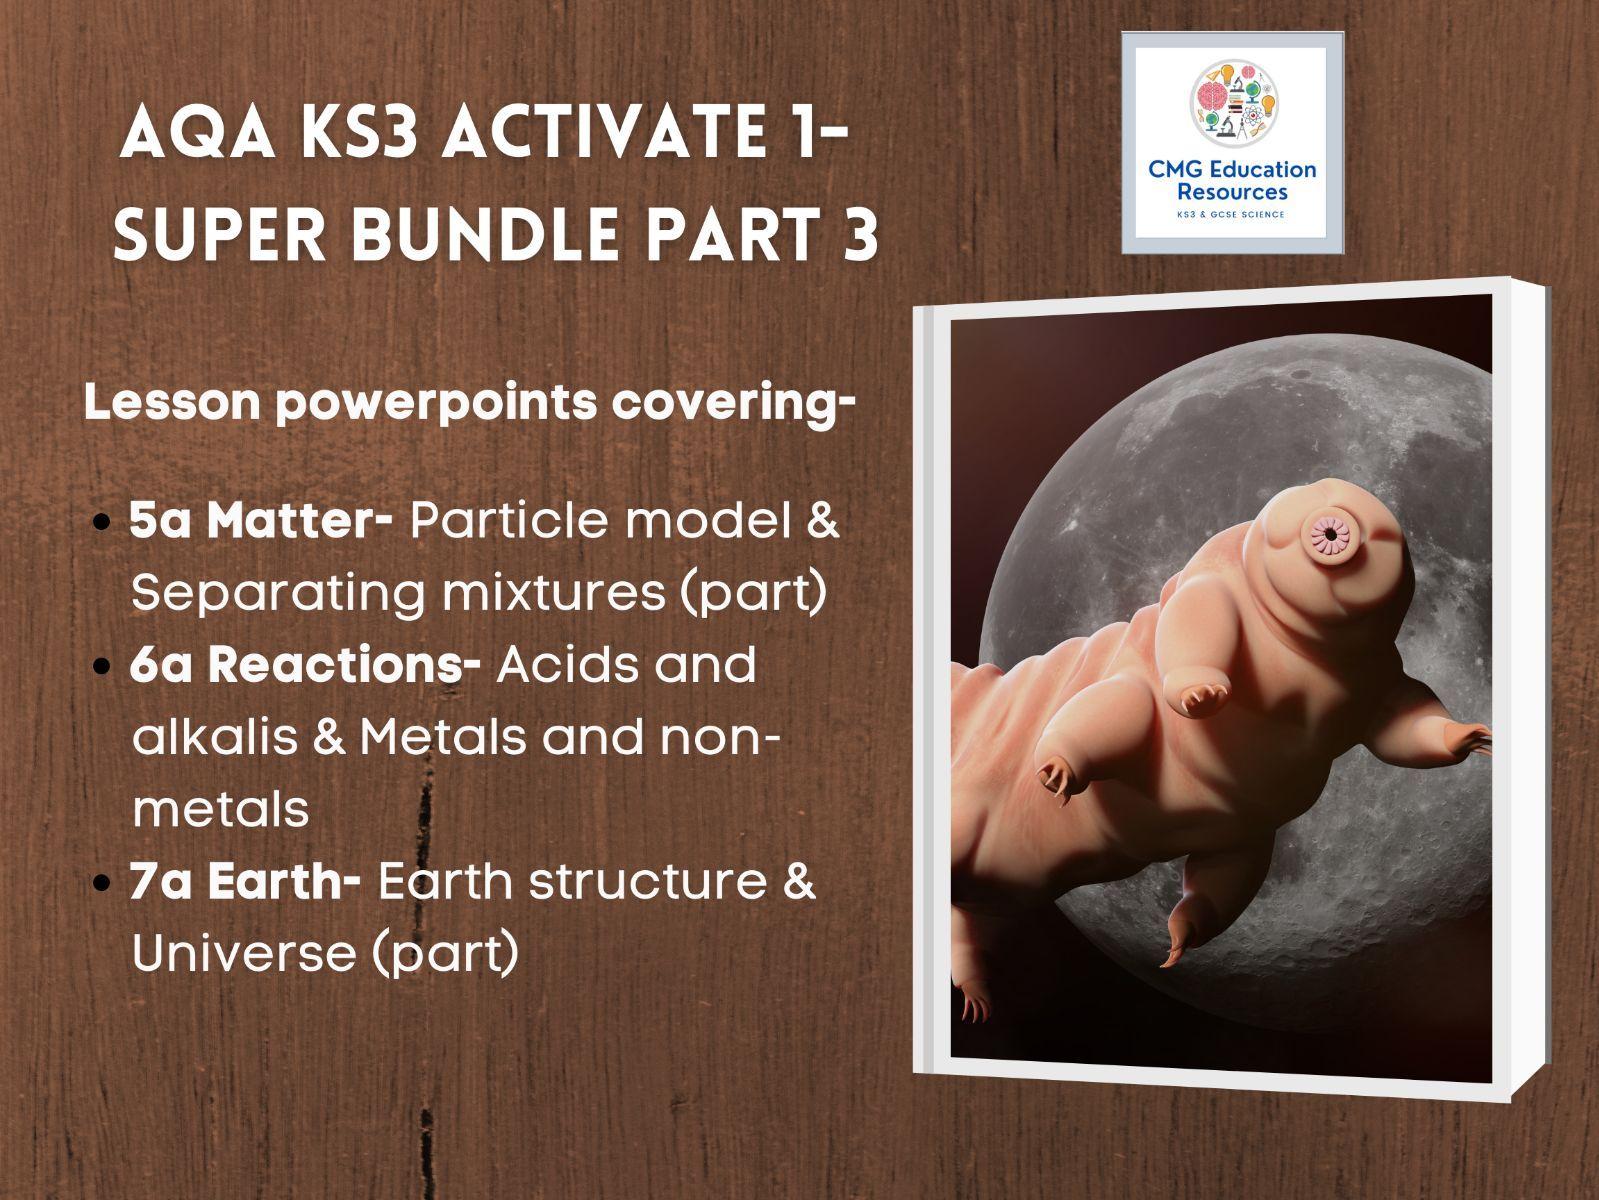 KS3 AQA Activate 1- Super bundle part 3/5